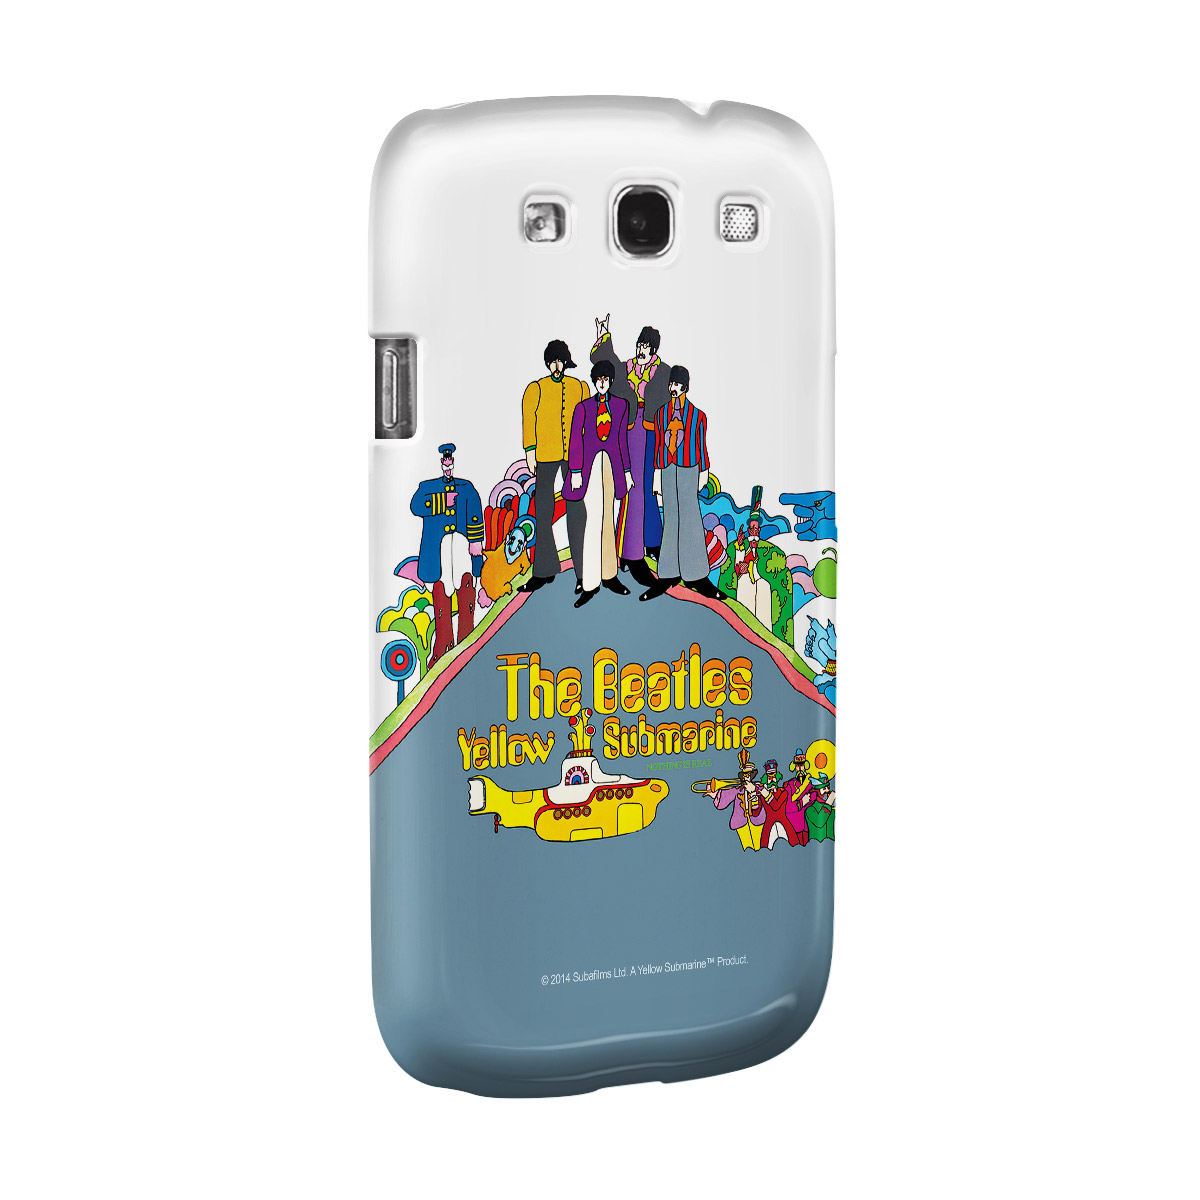 Capa para Samsung Galaxy S3 The Beatles Yellow Submarine Nothing Is Real